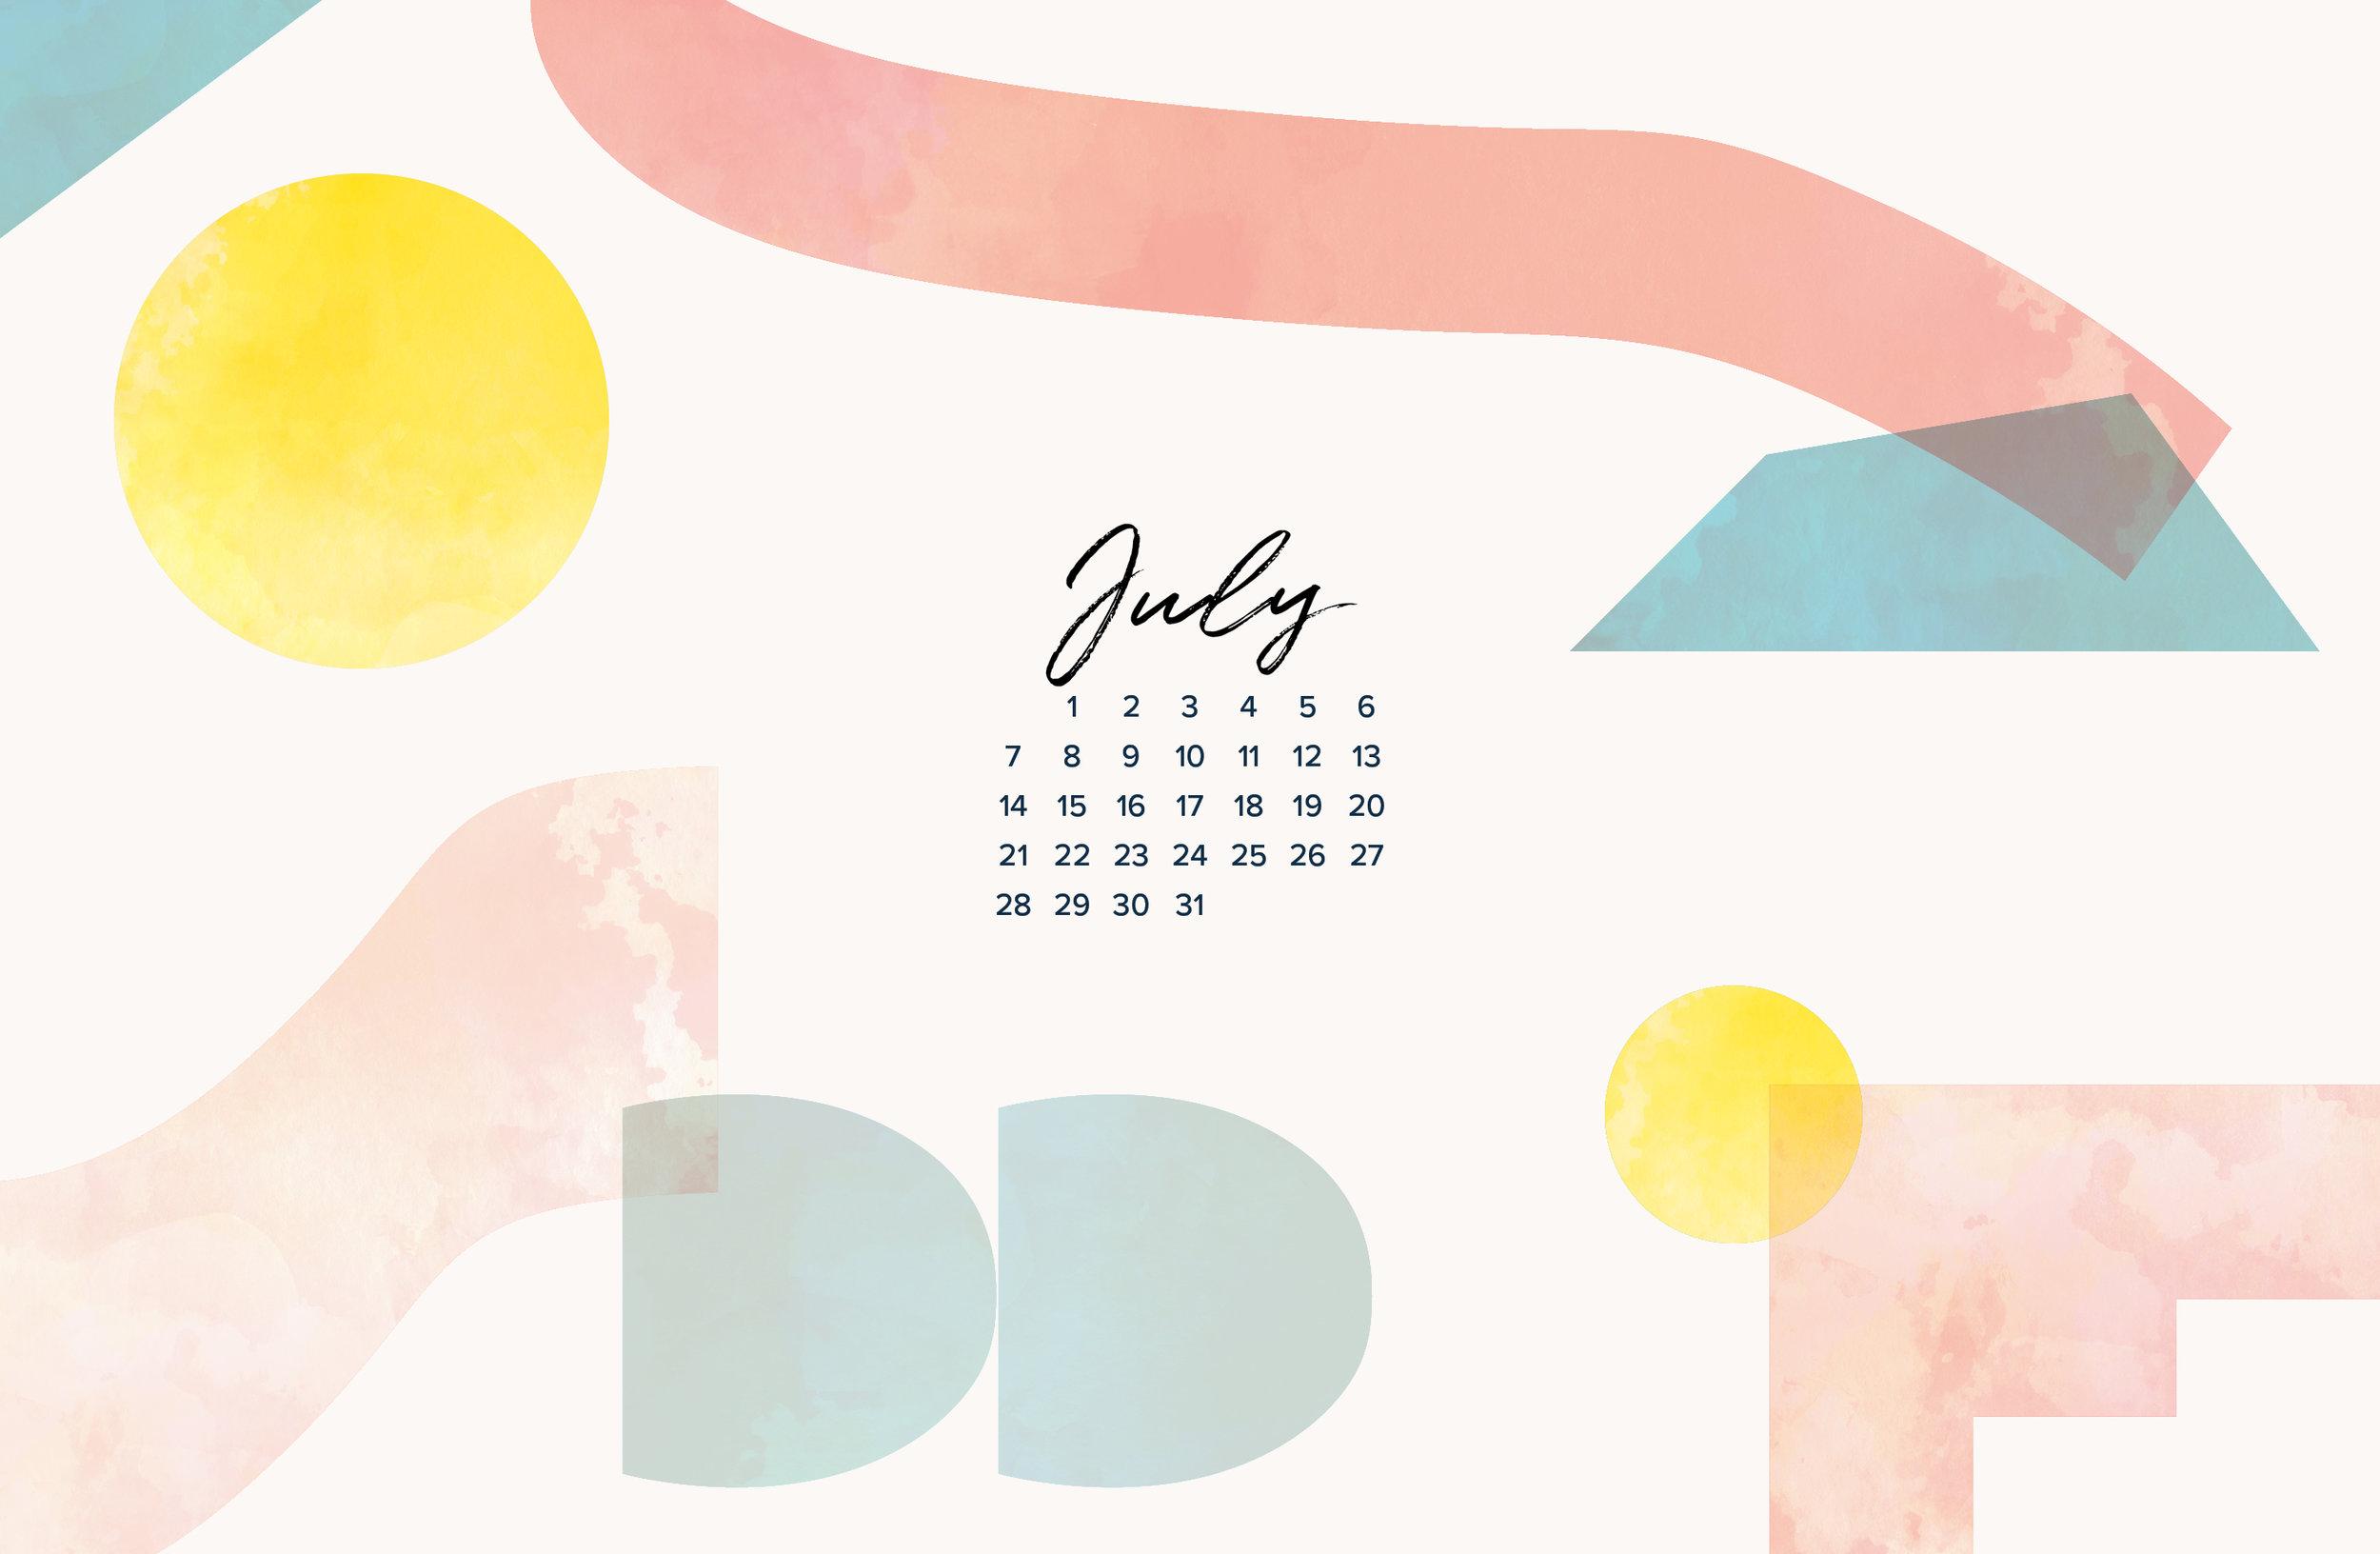 July_Summer_Freebies_1b.jpg